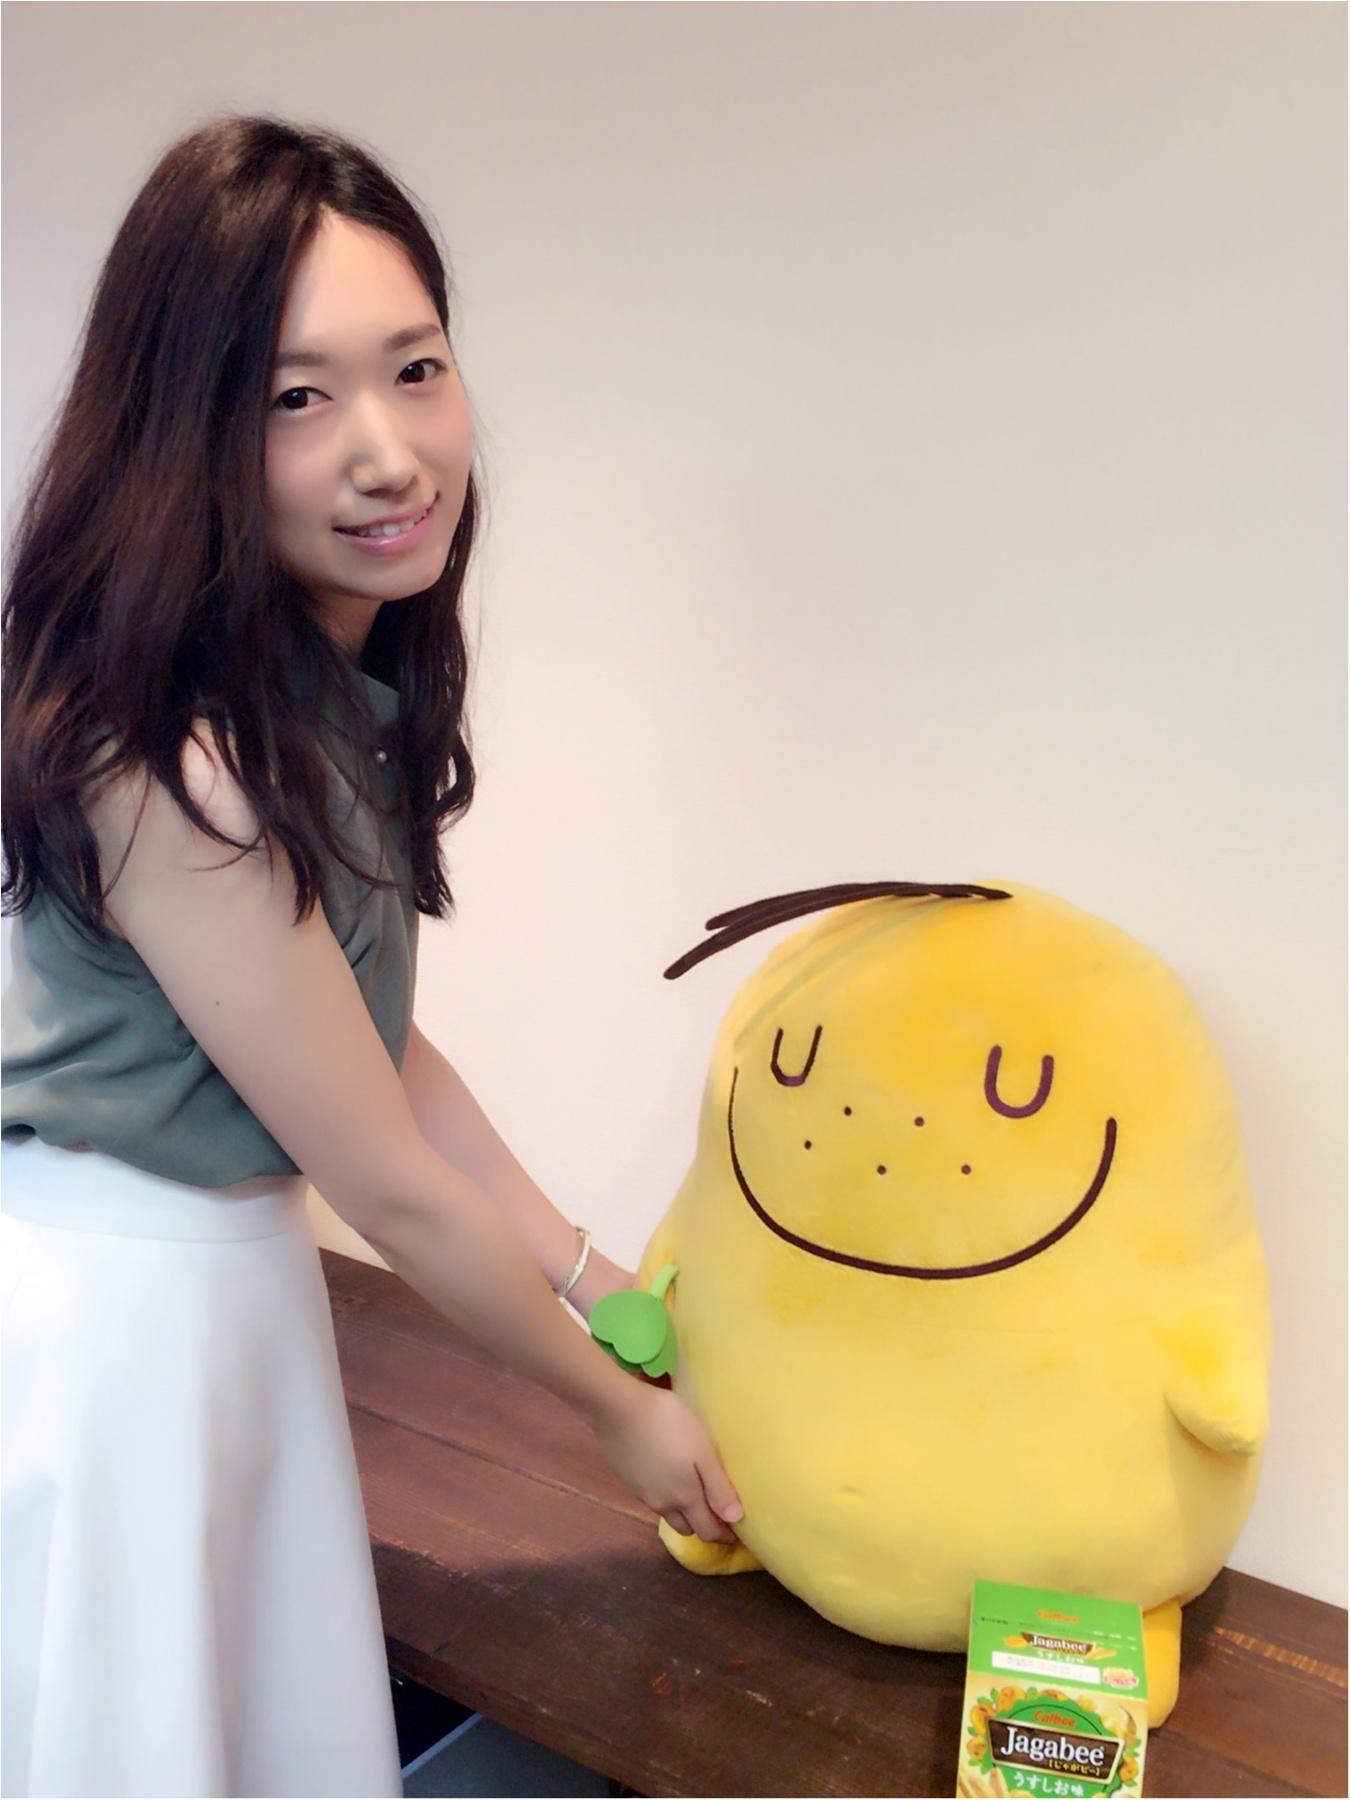 【RiCha♡ & samenyan】のリンクコーデ♡佐藤ありさちゃんの白スカートコーデ編≪samenyan≫_3